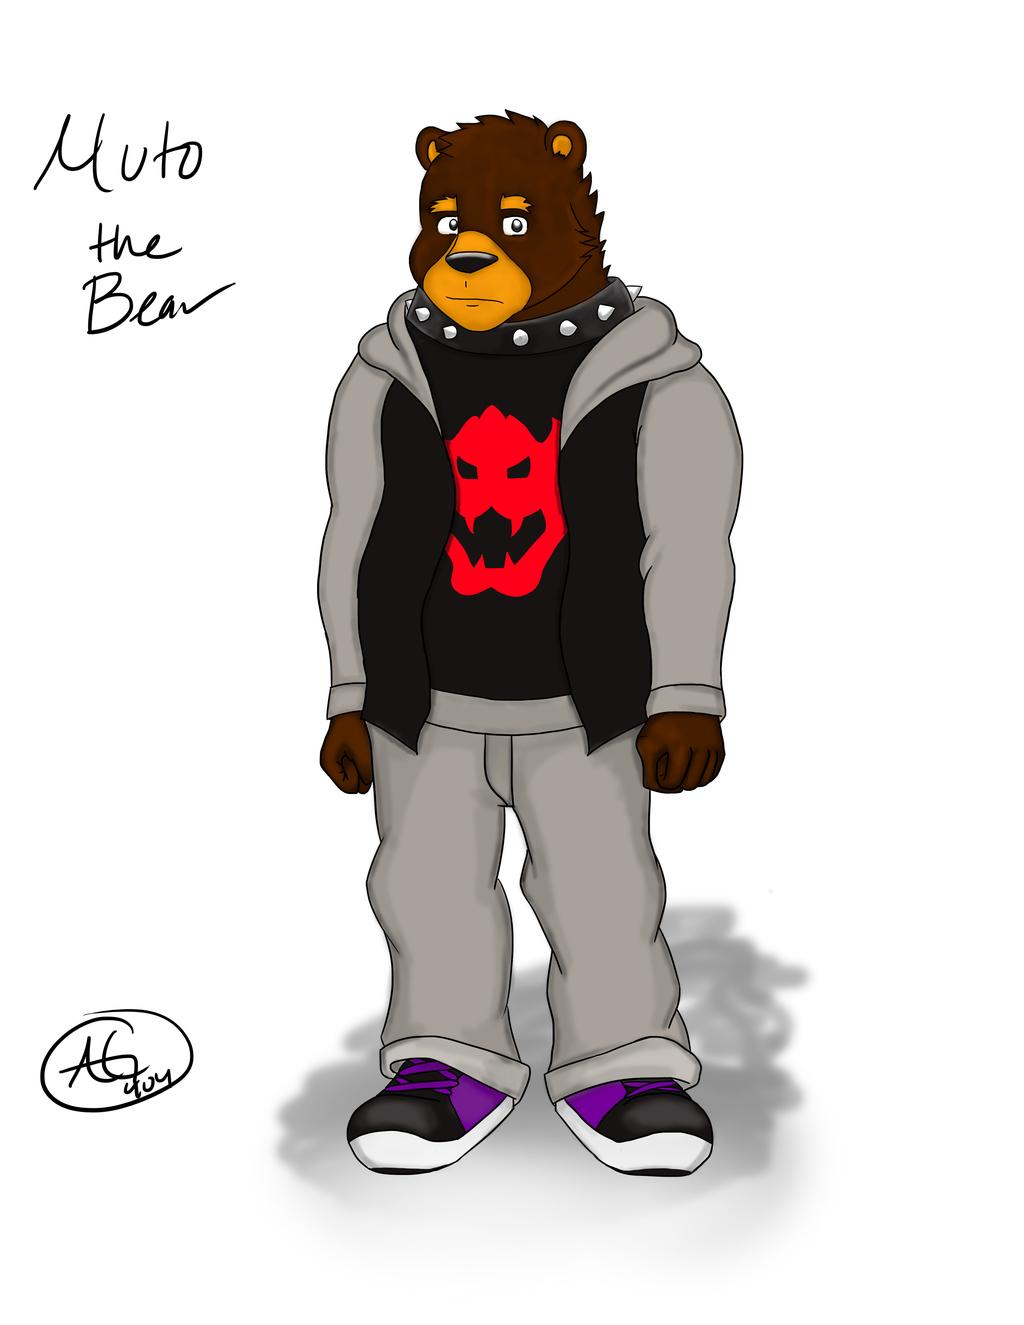 Muto the Bear